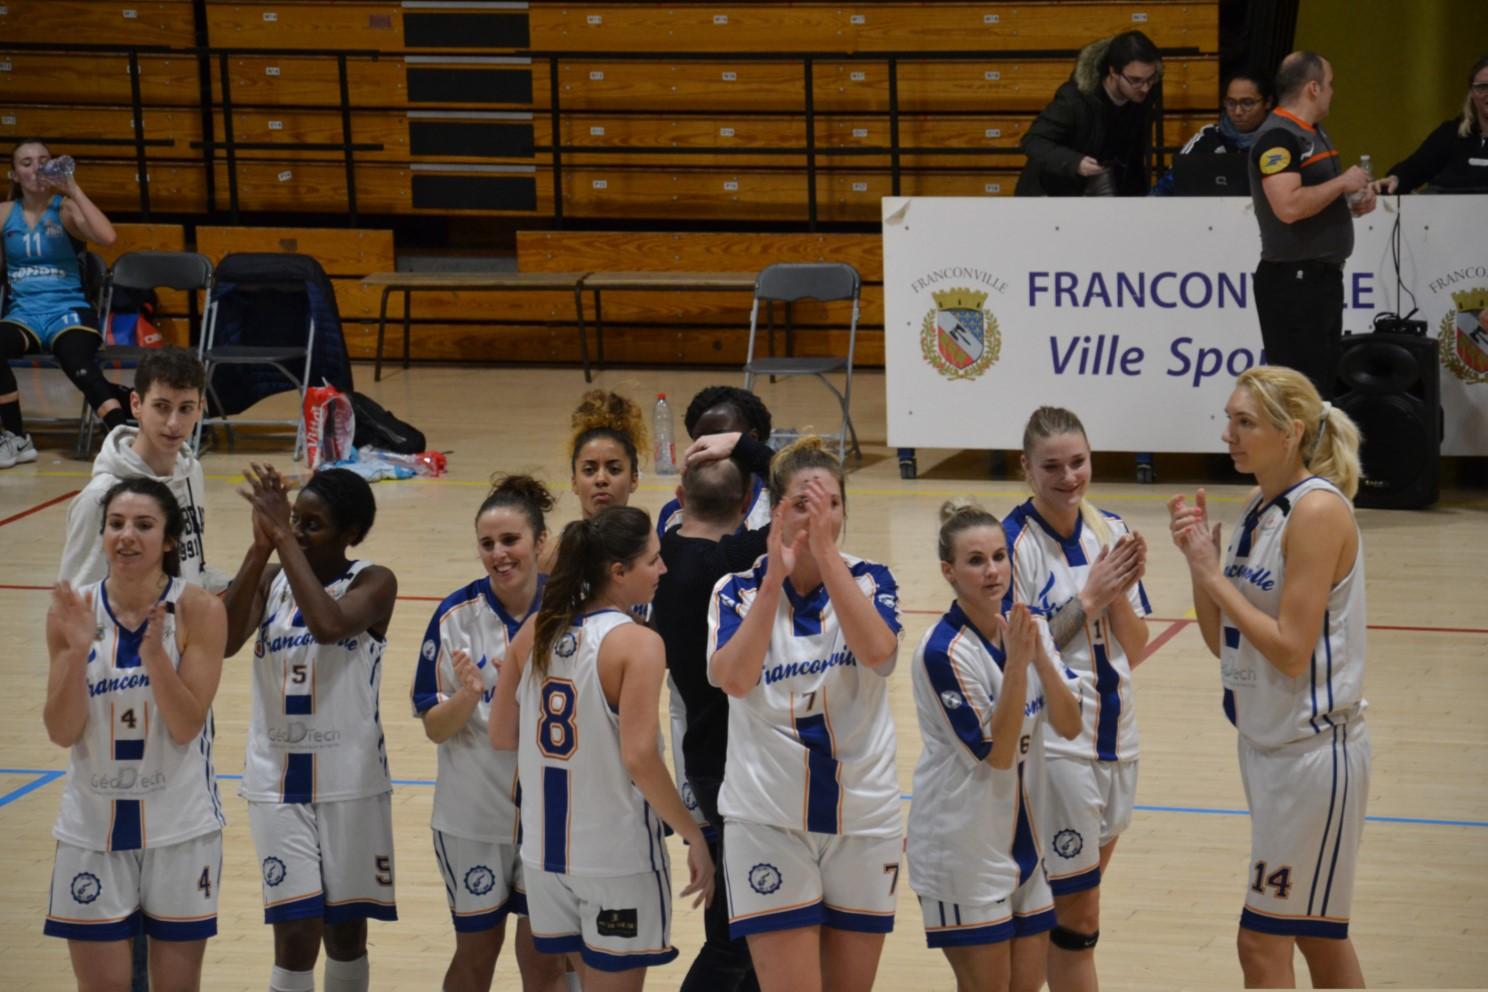 Equipe de Franconville PB